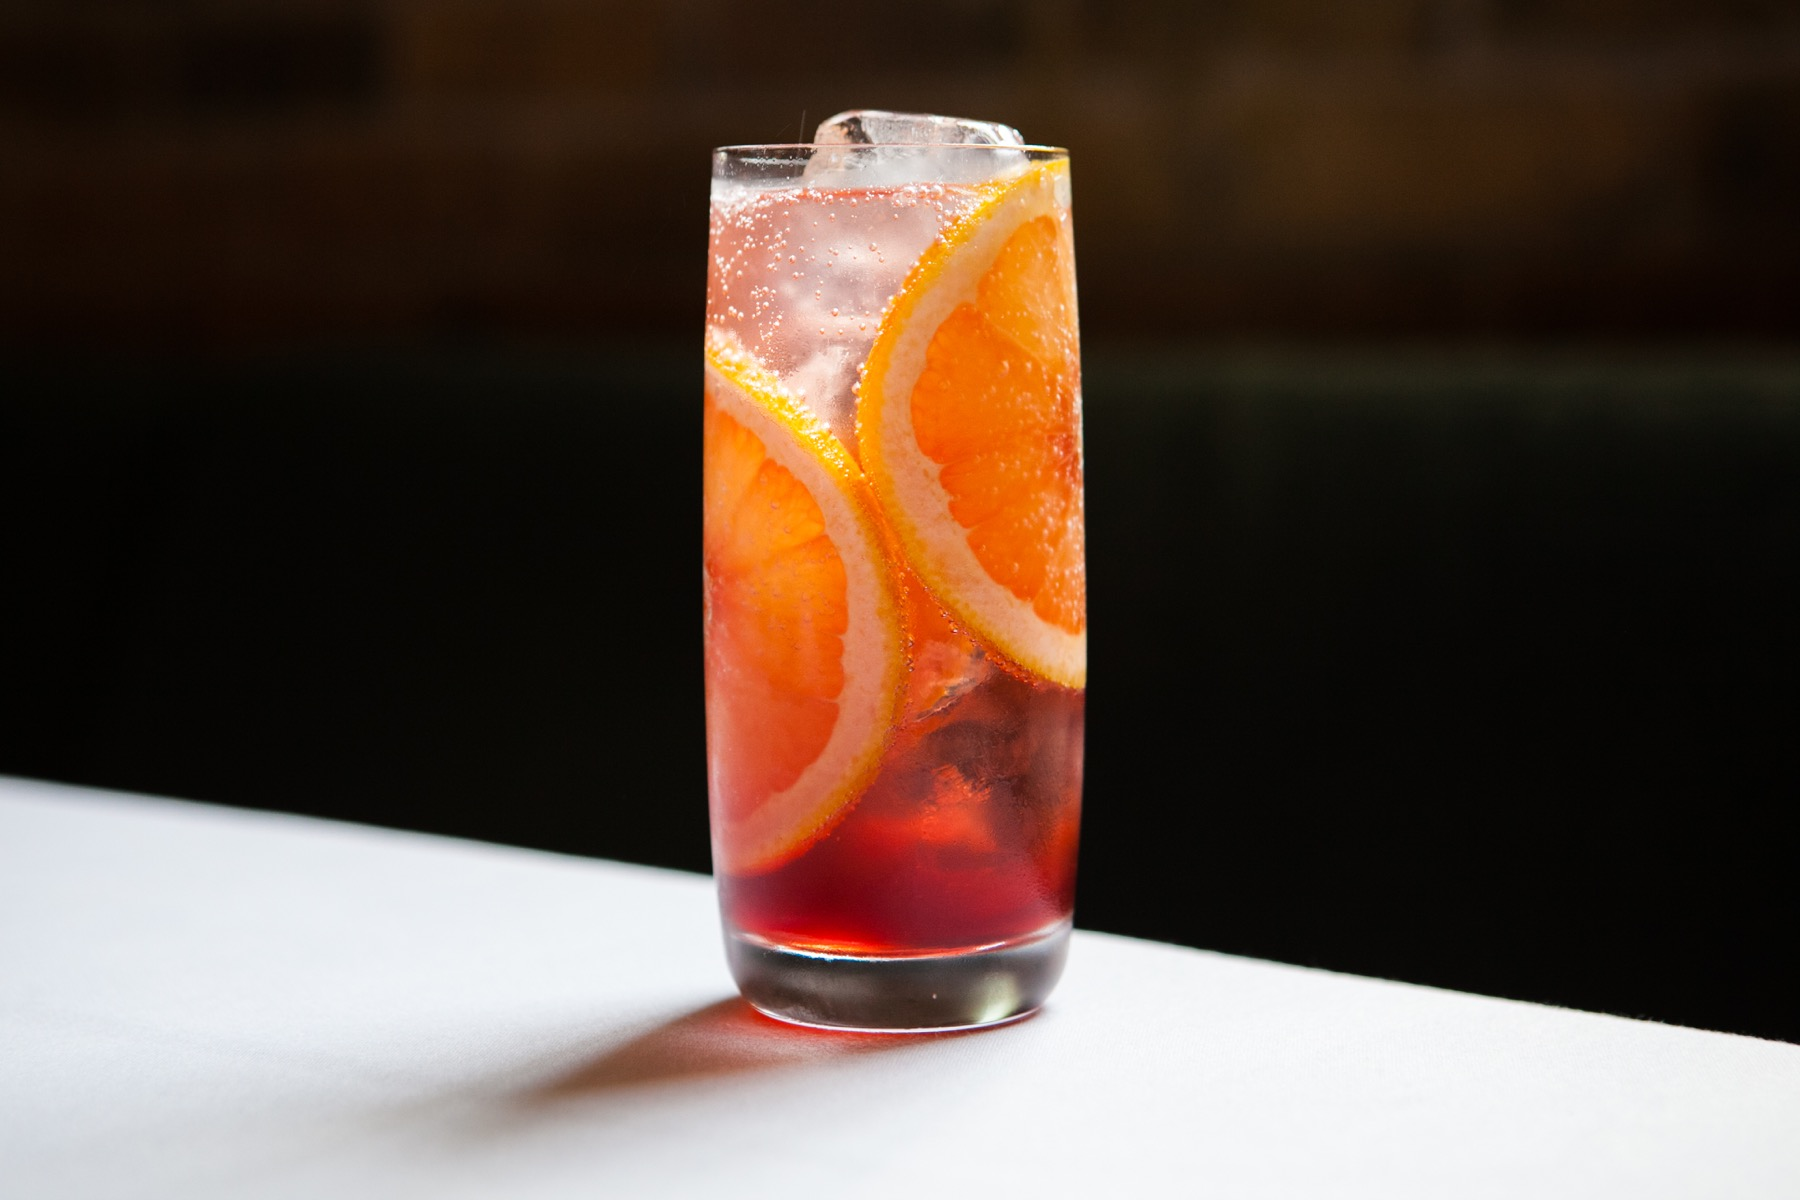 Oriole spirit-free drink